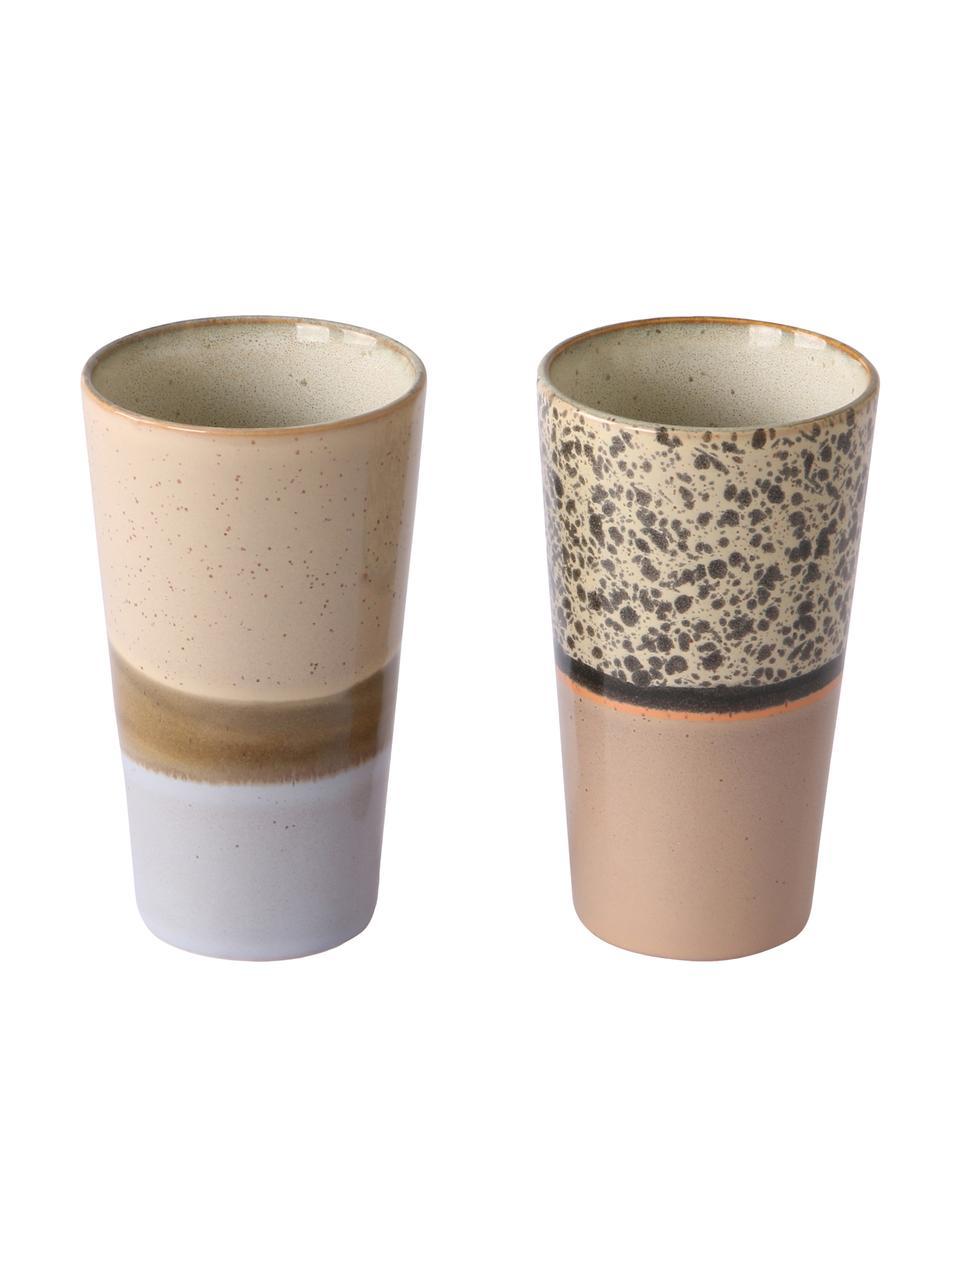 Handgemaakte bekerset 70's in retro stijl, 2-delig, Keramiek, Multicolour, bruintinten, Ø 8 x H 13 cm